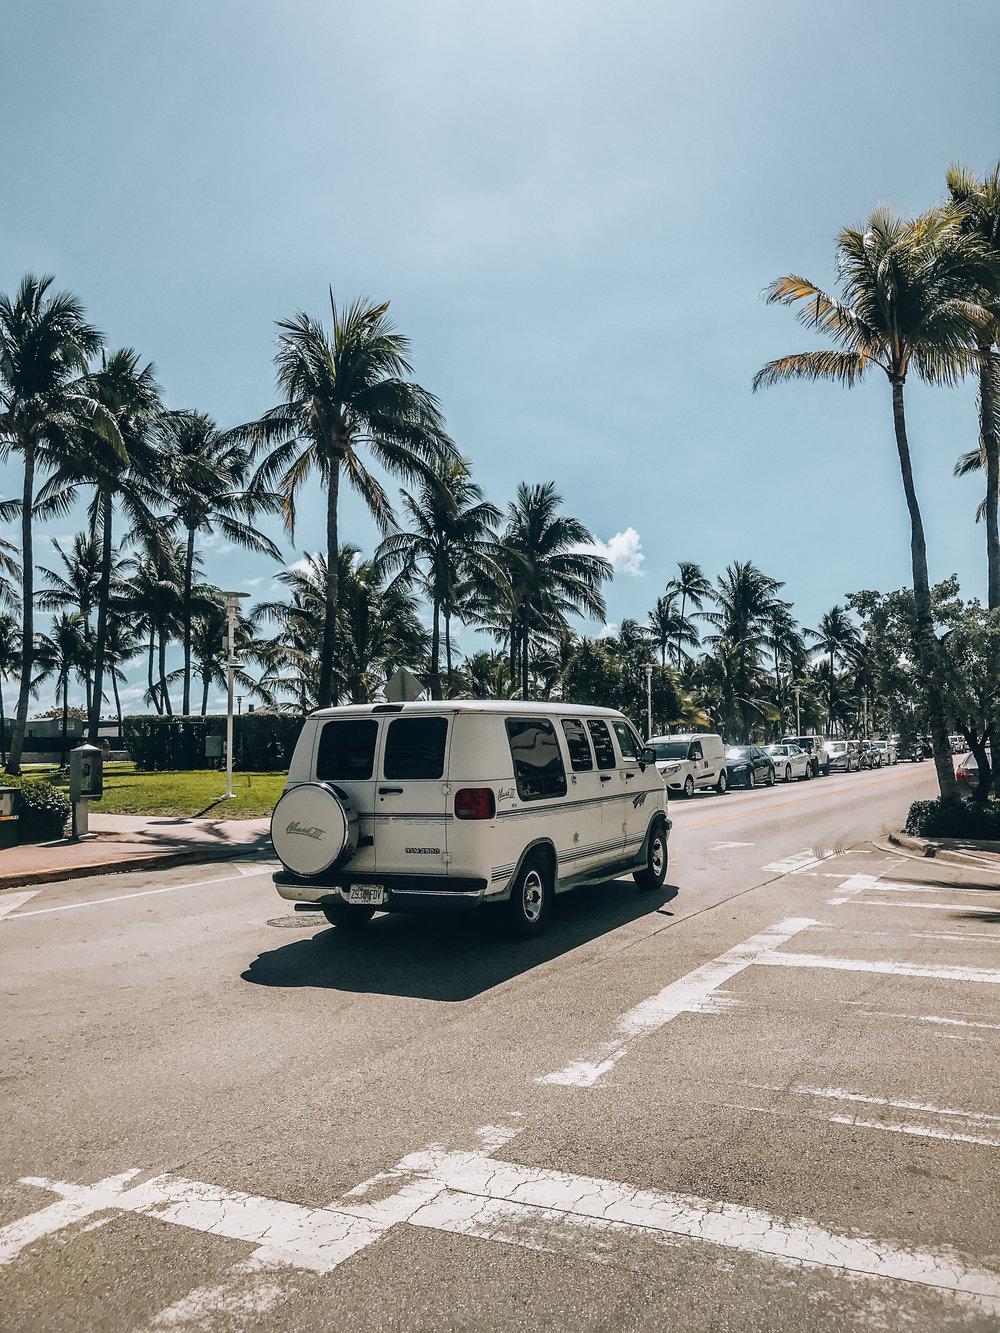 Copy of Ocean Drive